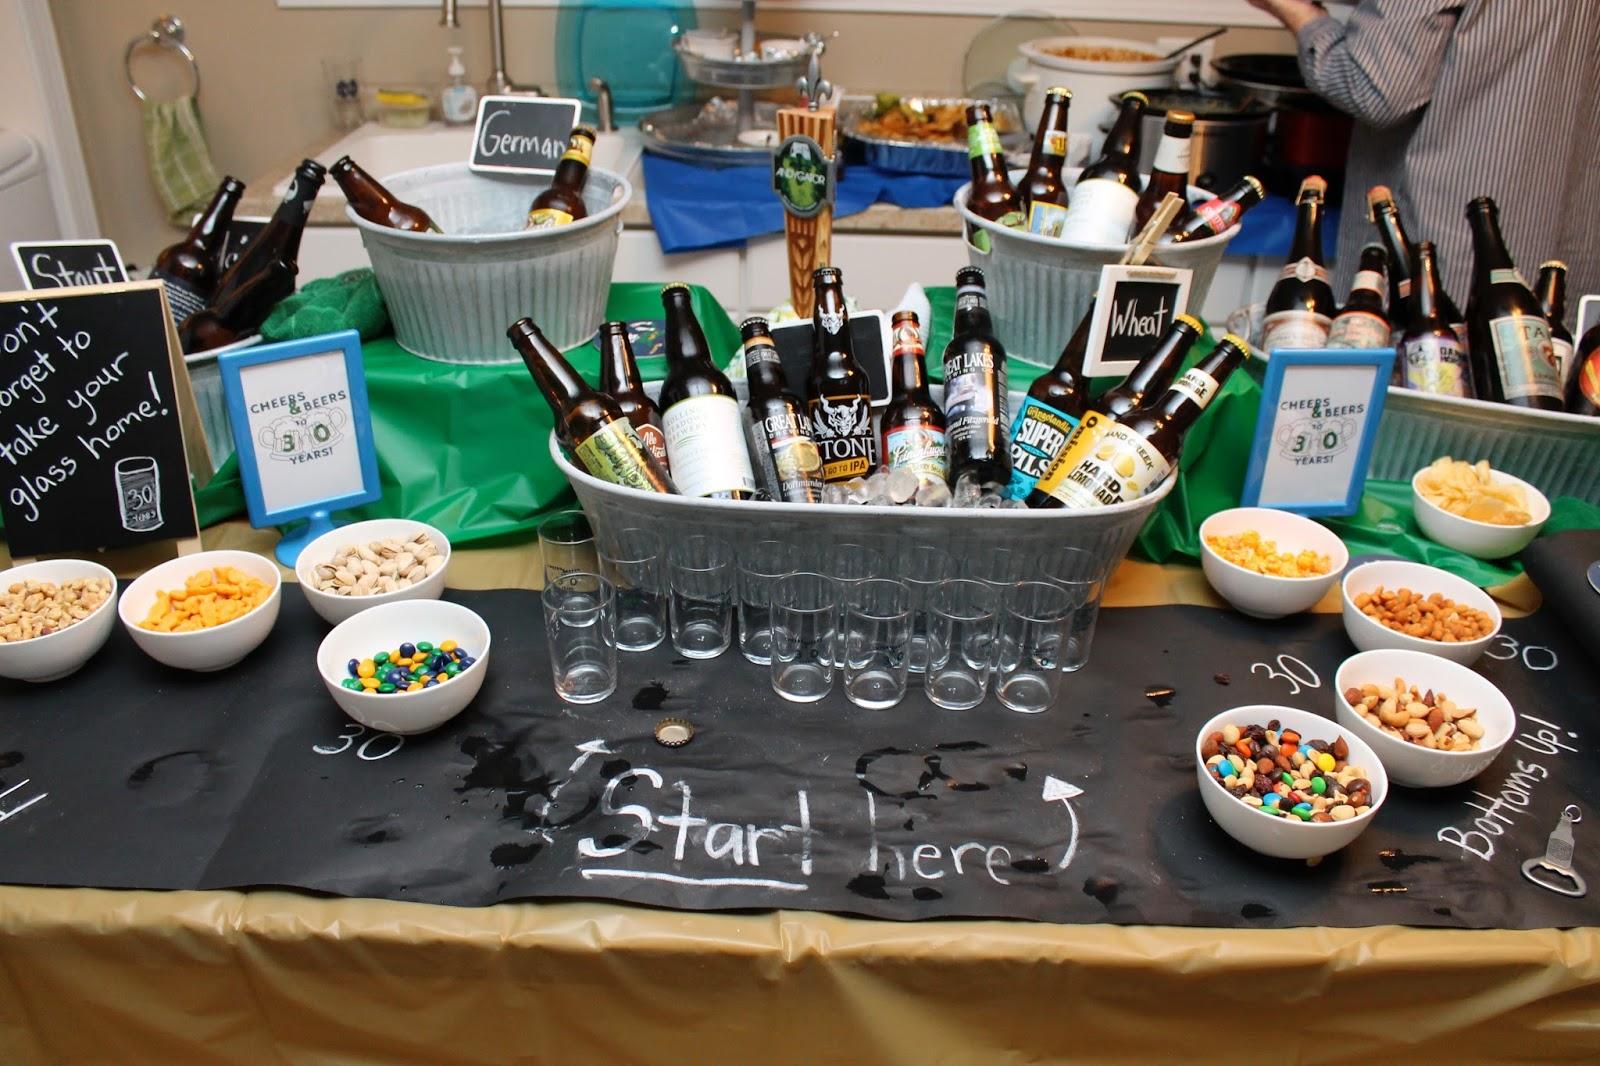 Birthday Birthday Party Ideas: Krafty Kate Kreations: Parties